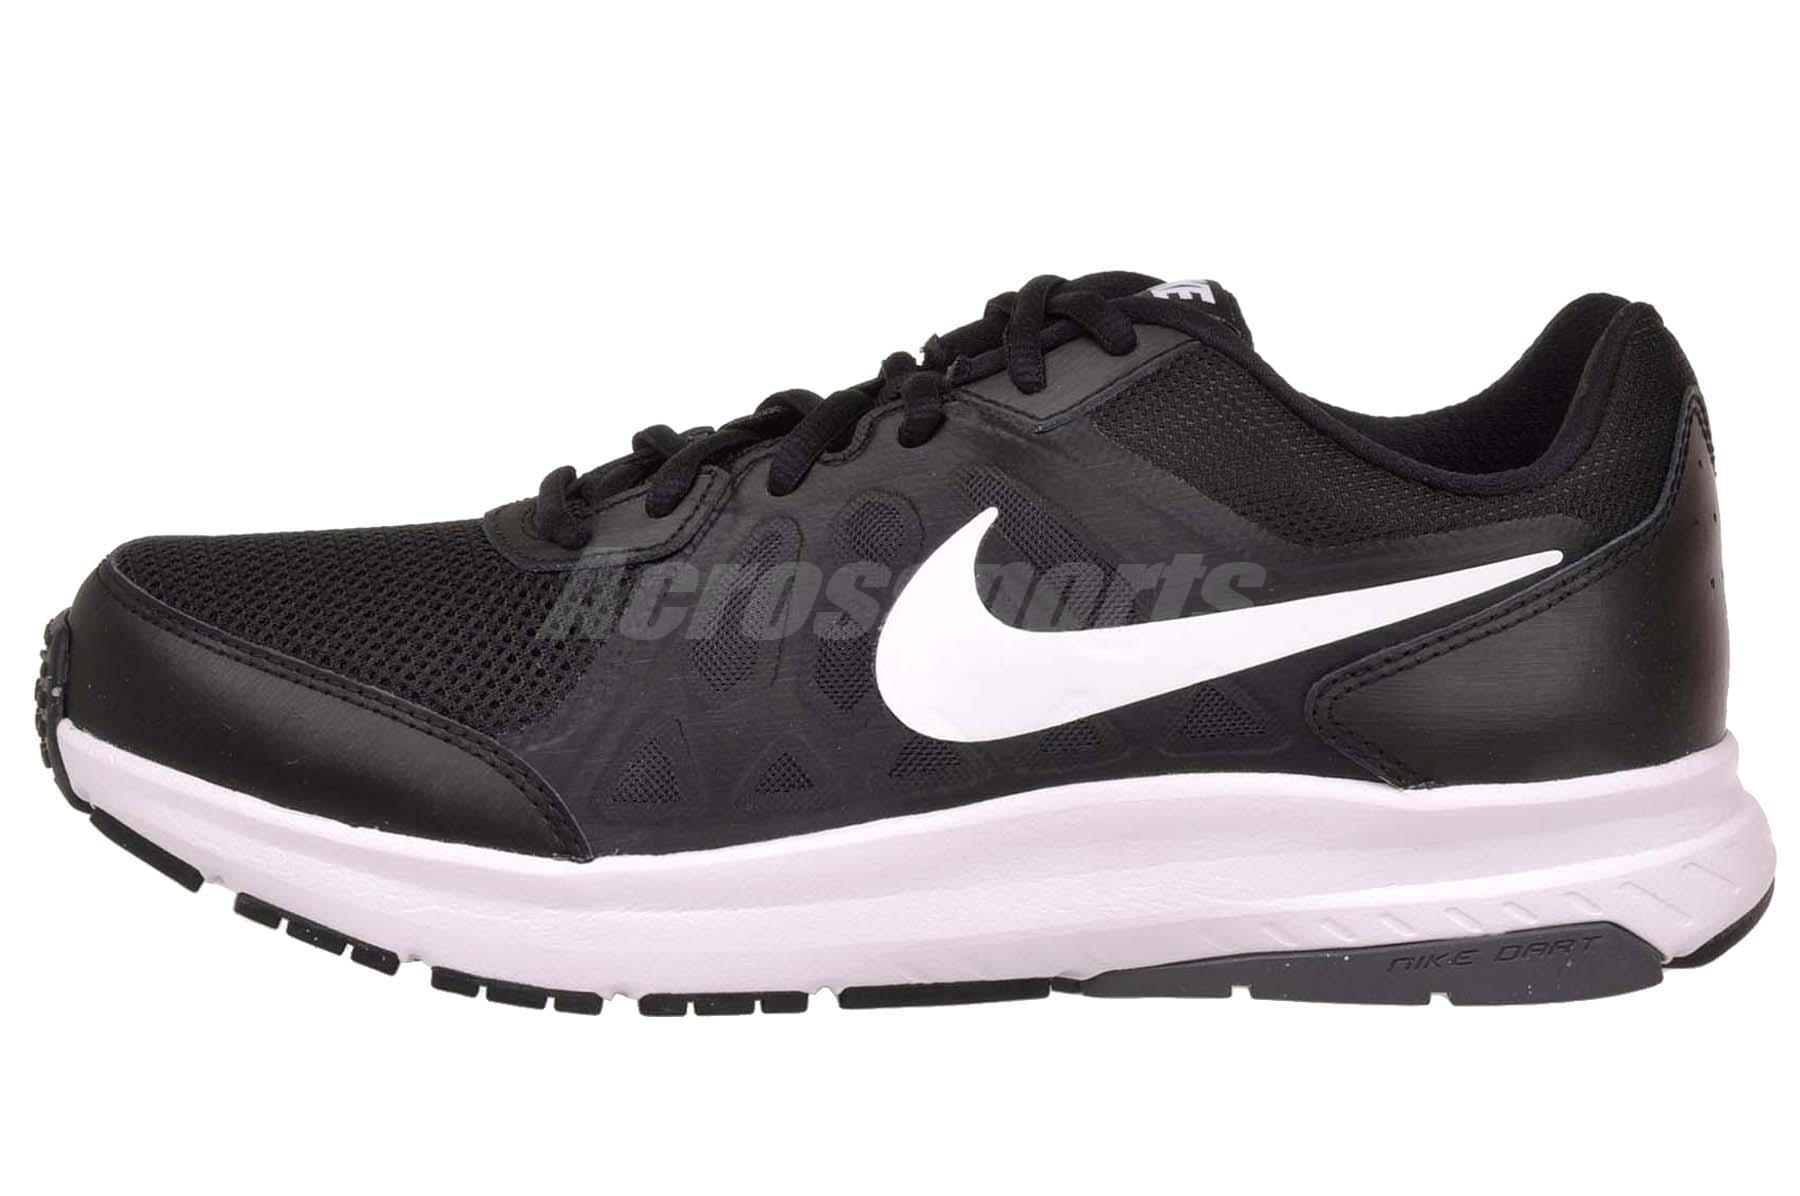 nike dart 11 wide 4e mens running shoes sneakers 724942 001